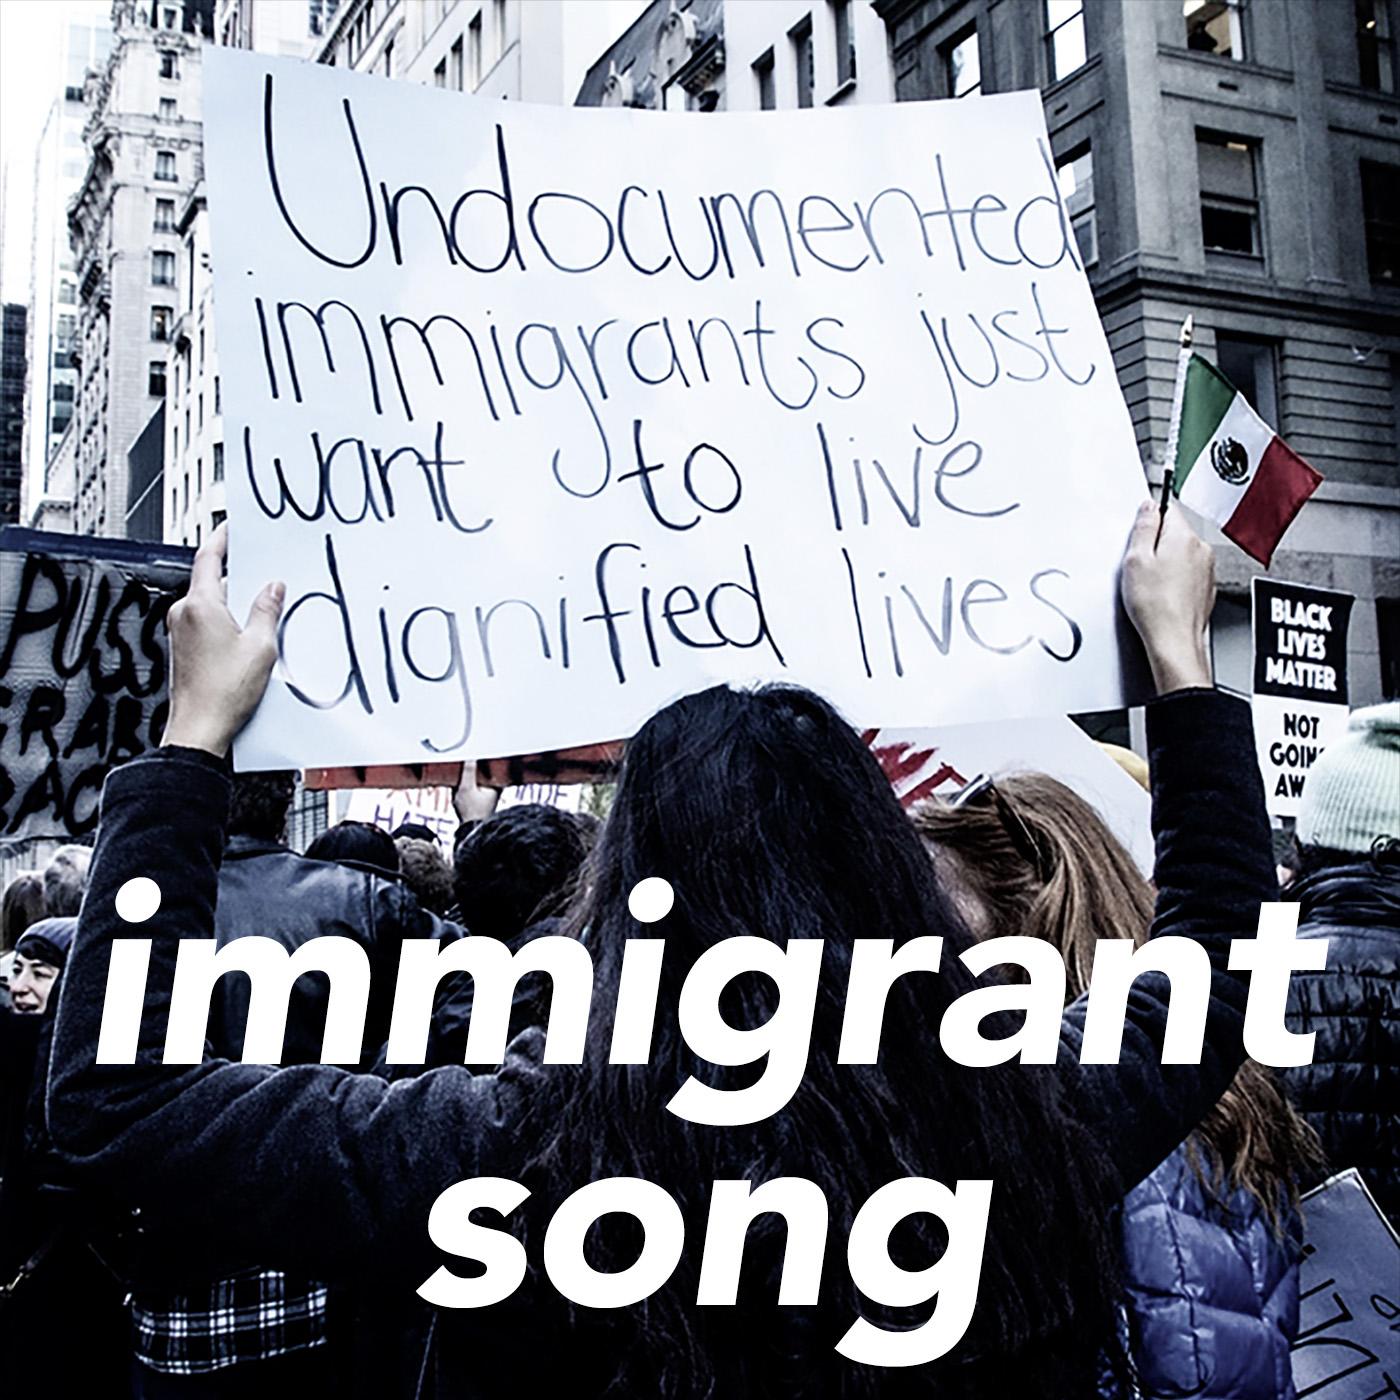 immigrantIconLG.jpg